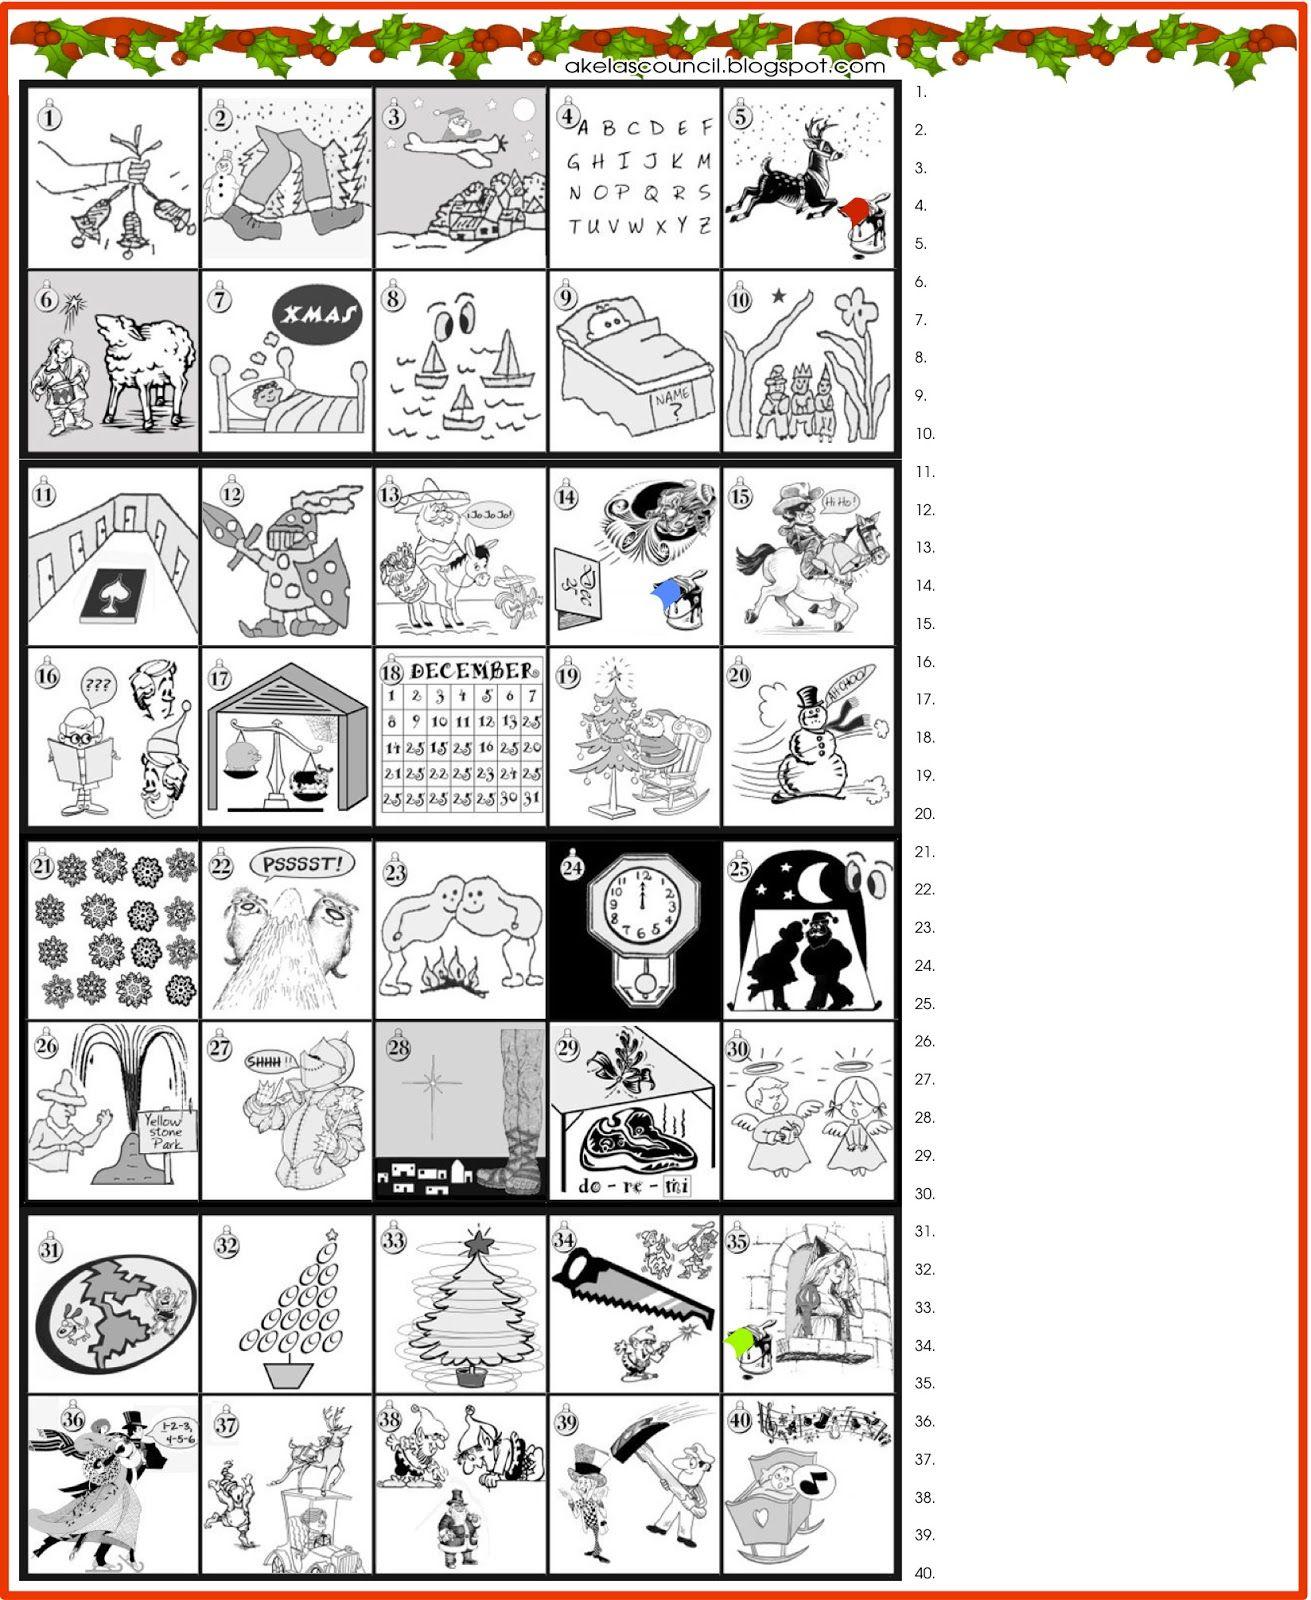 Printable * Guess The Christmas Songs Or Carols Word Puzzle - Free - Printable Free Puzzle Games